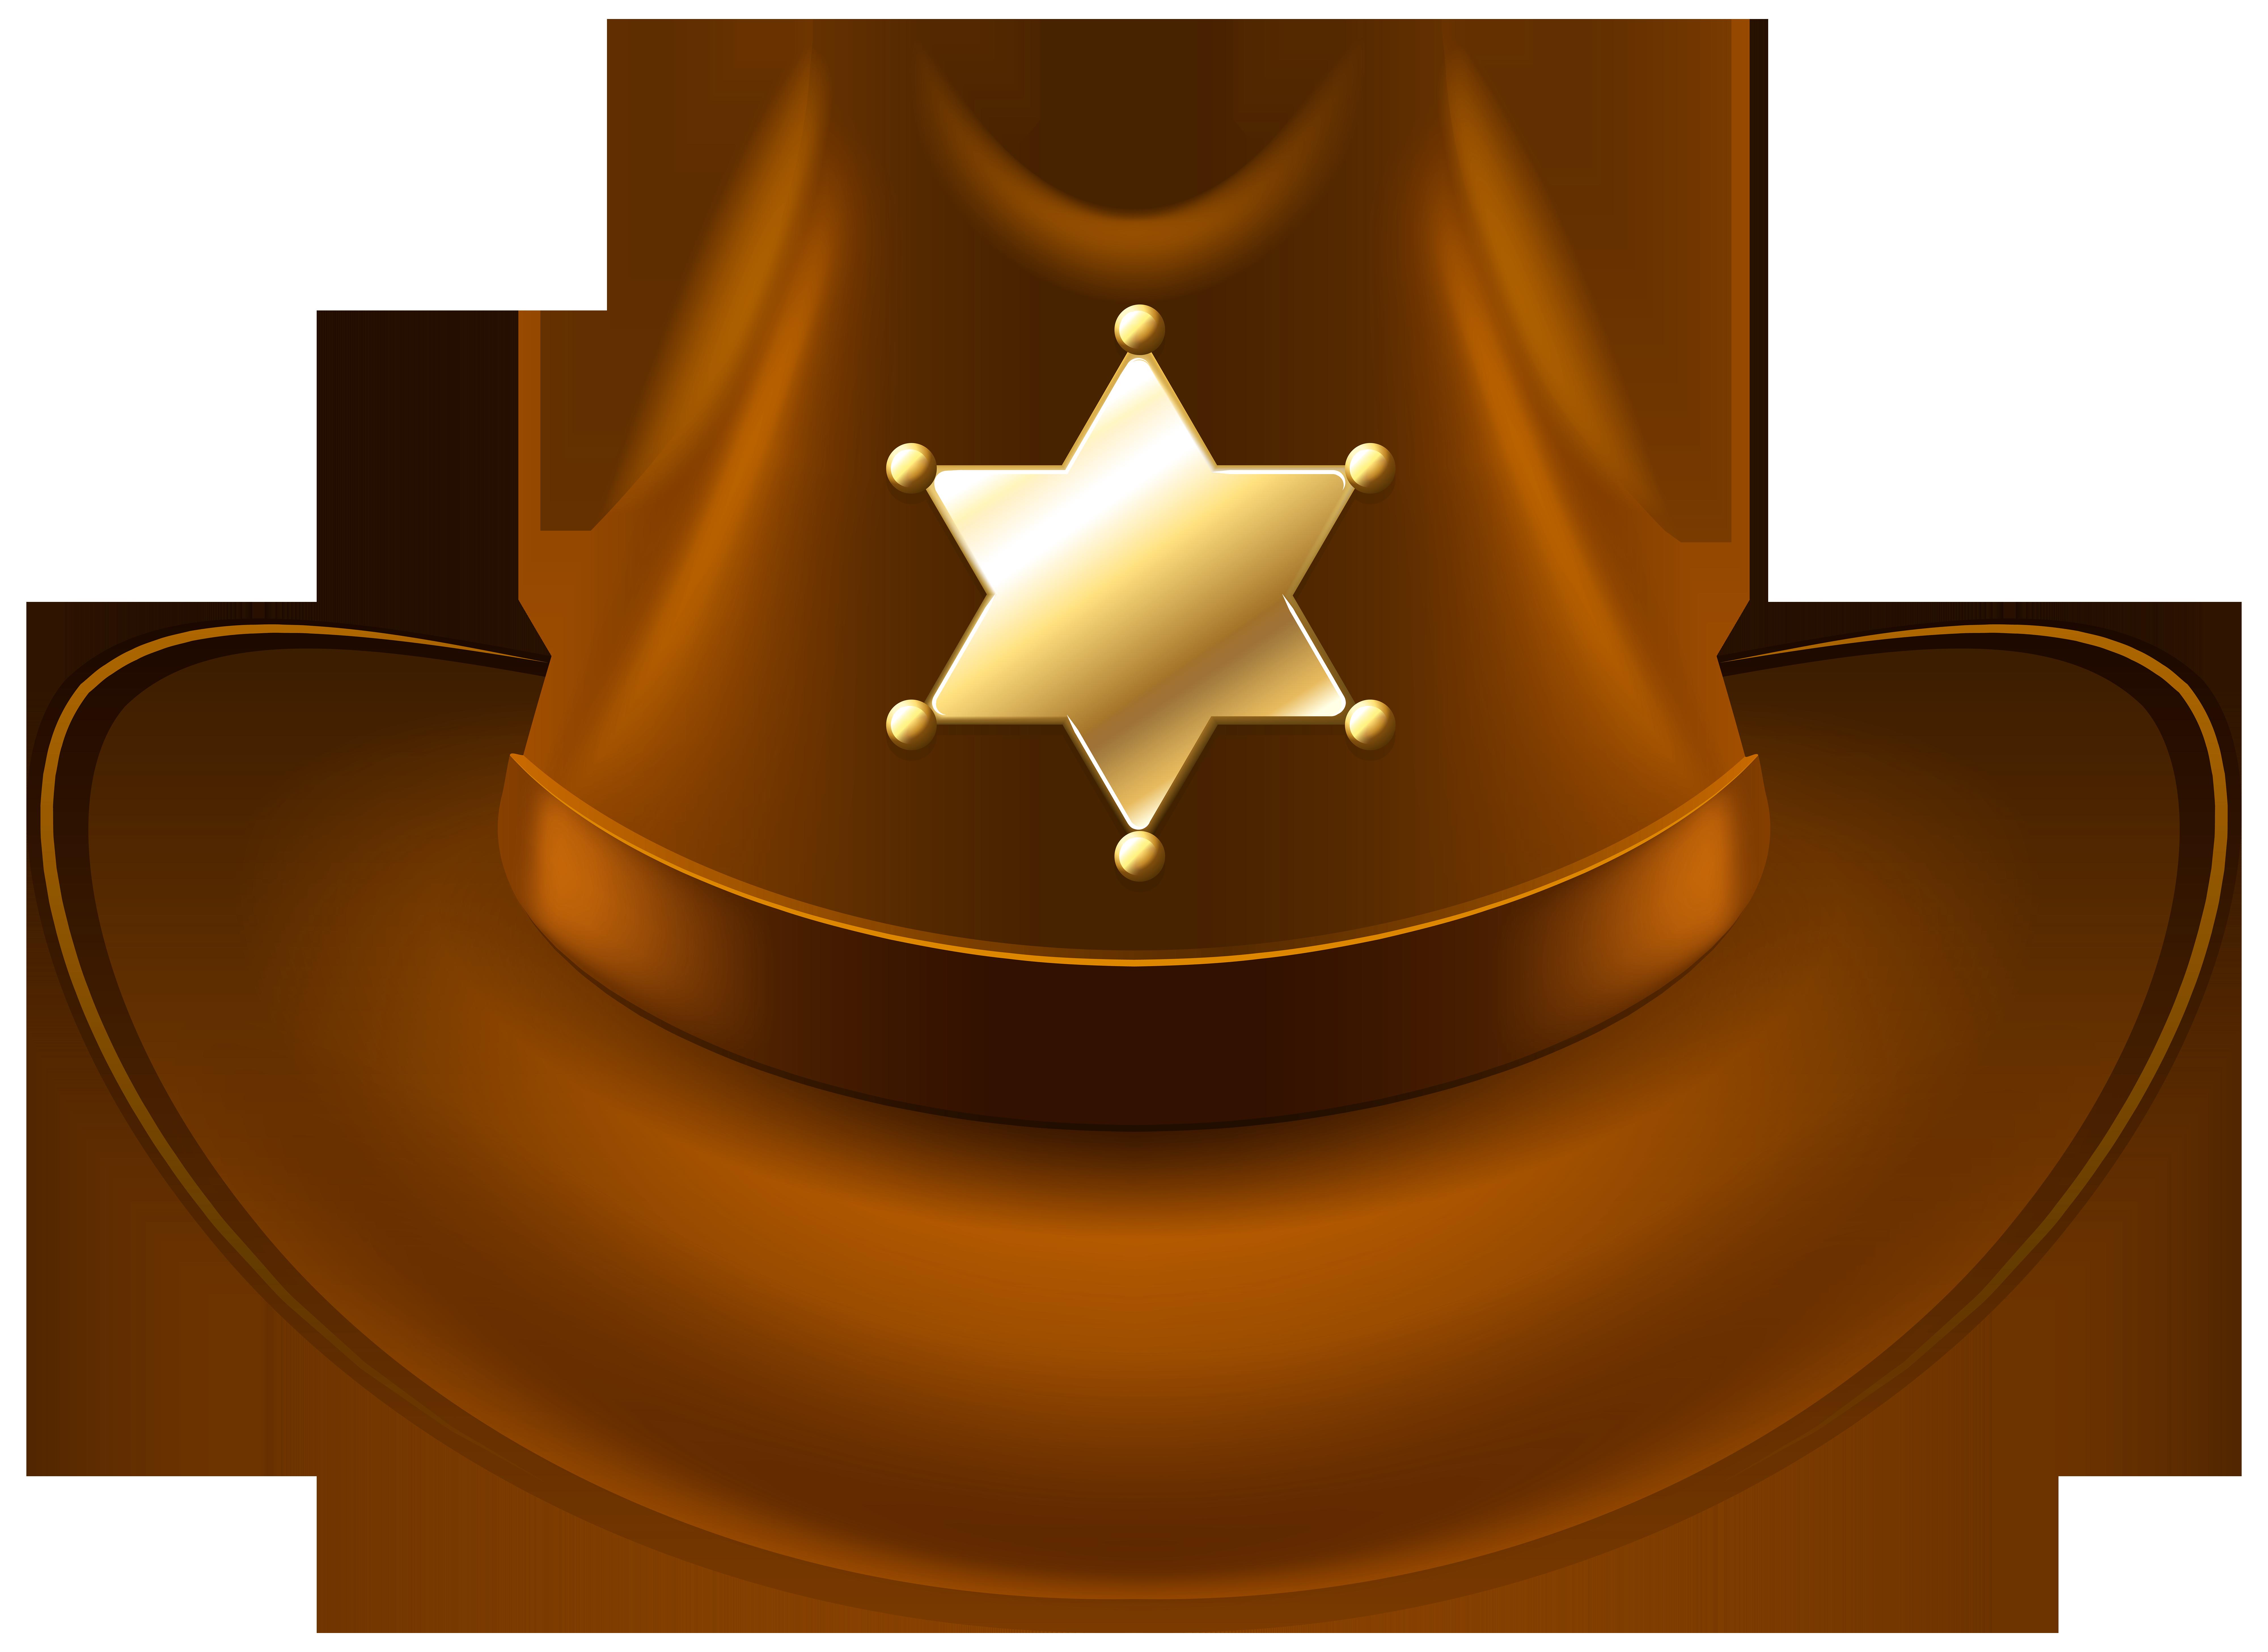 Sheriff Cowboy Hats Clipart U0026middot;-Sheriff Cowboy Hats Clipart u0026middot; «-18